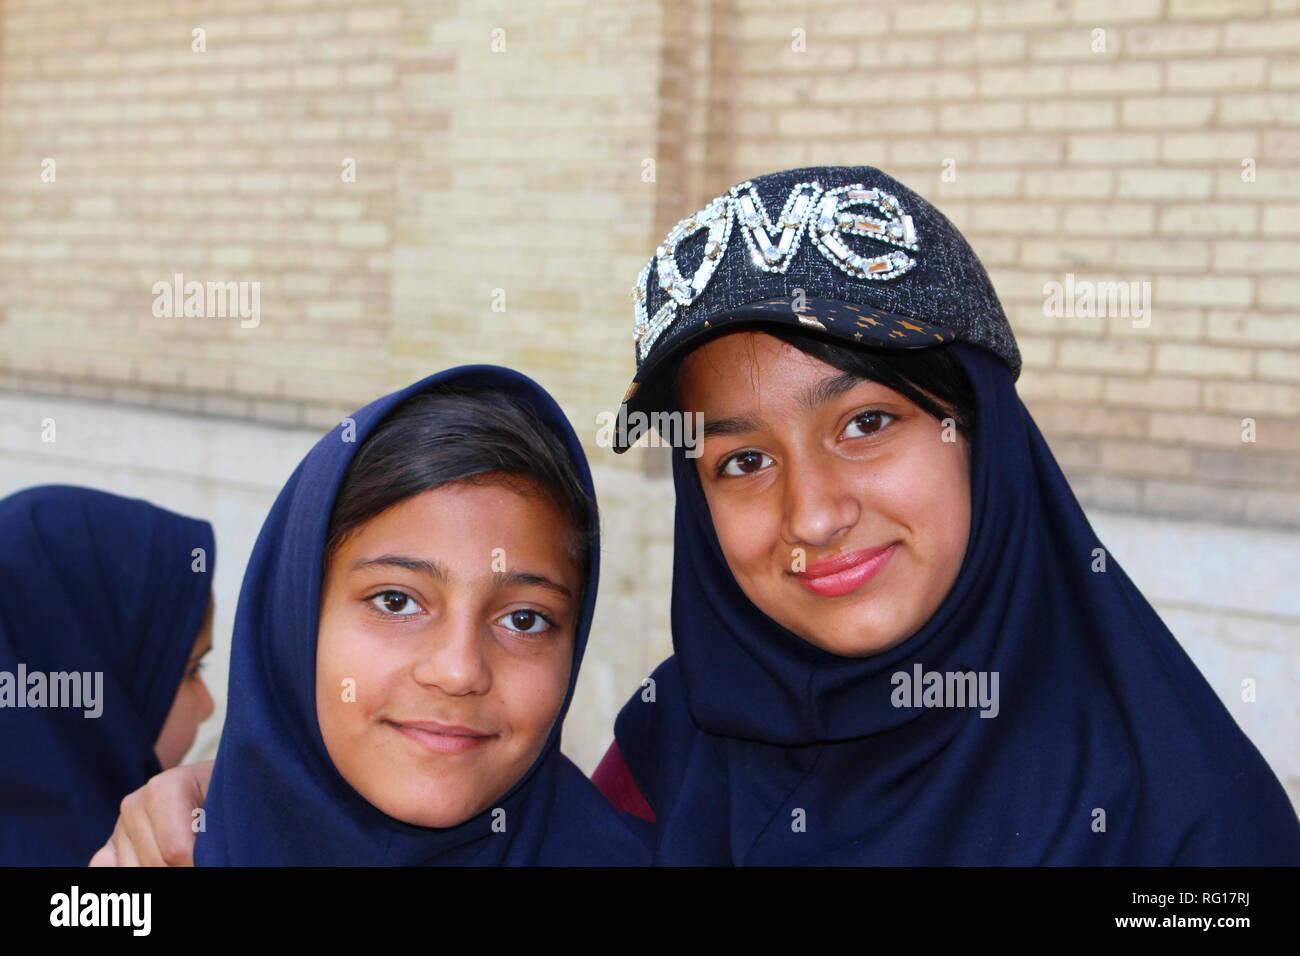 Young iranian girls, Shiraz, Iran - Stock Image